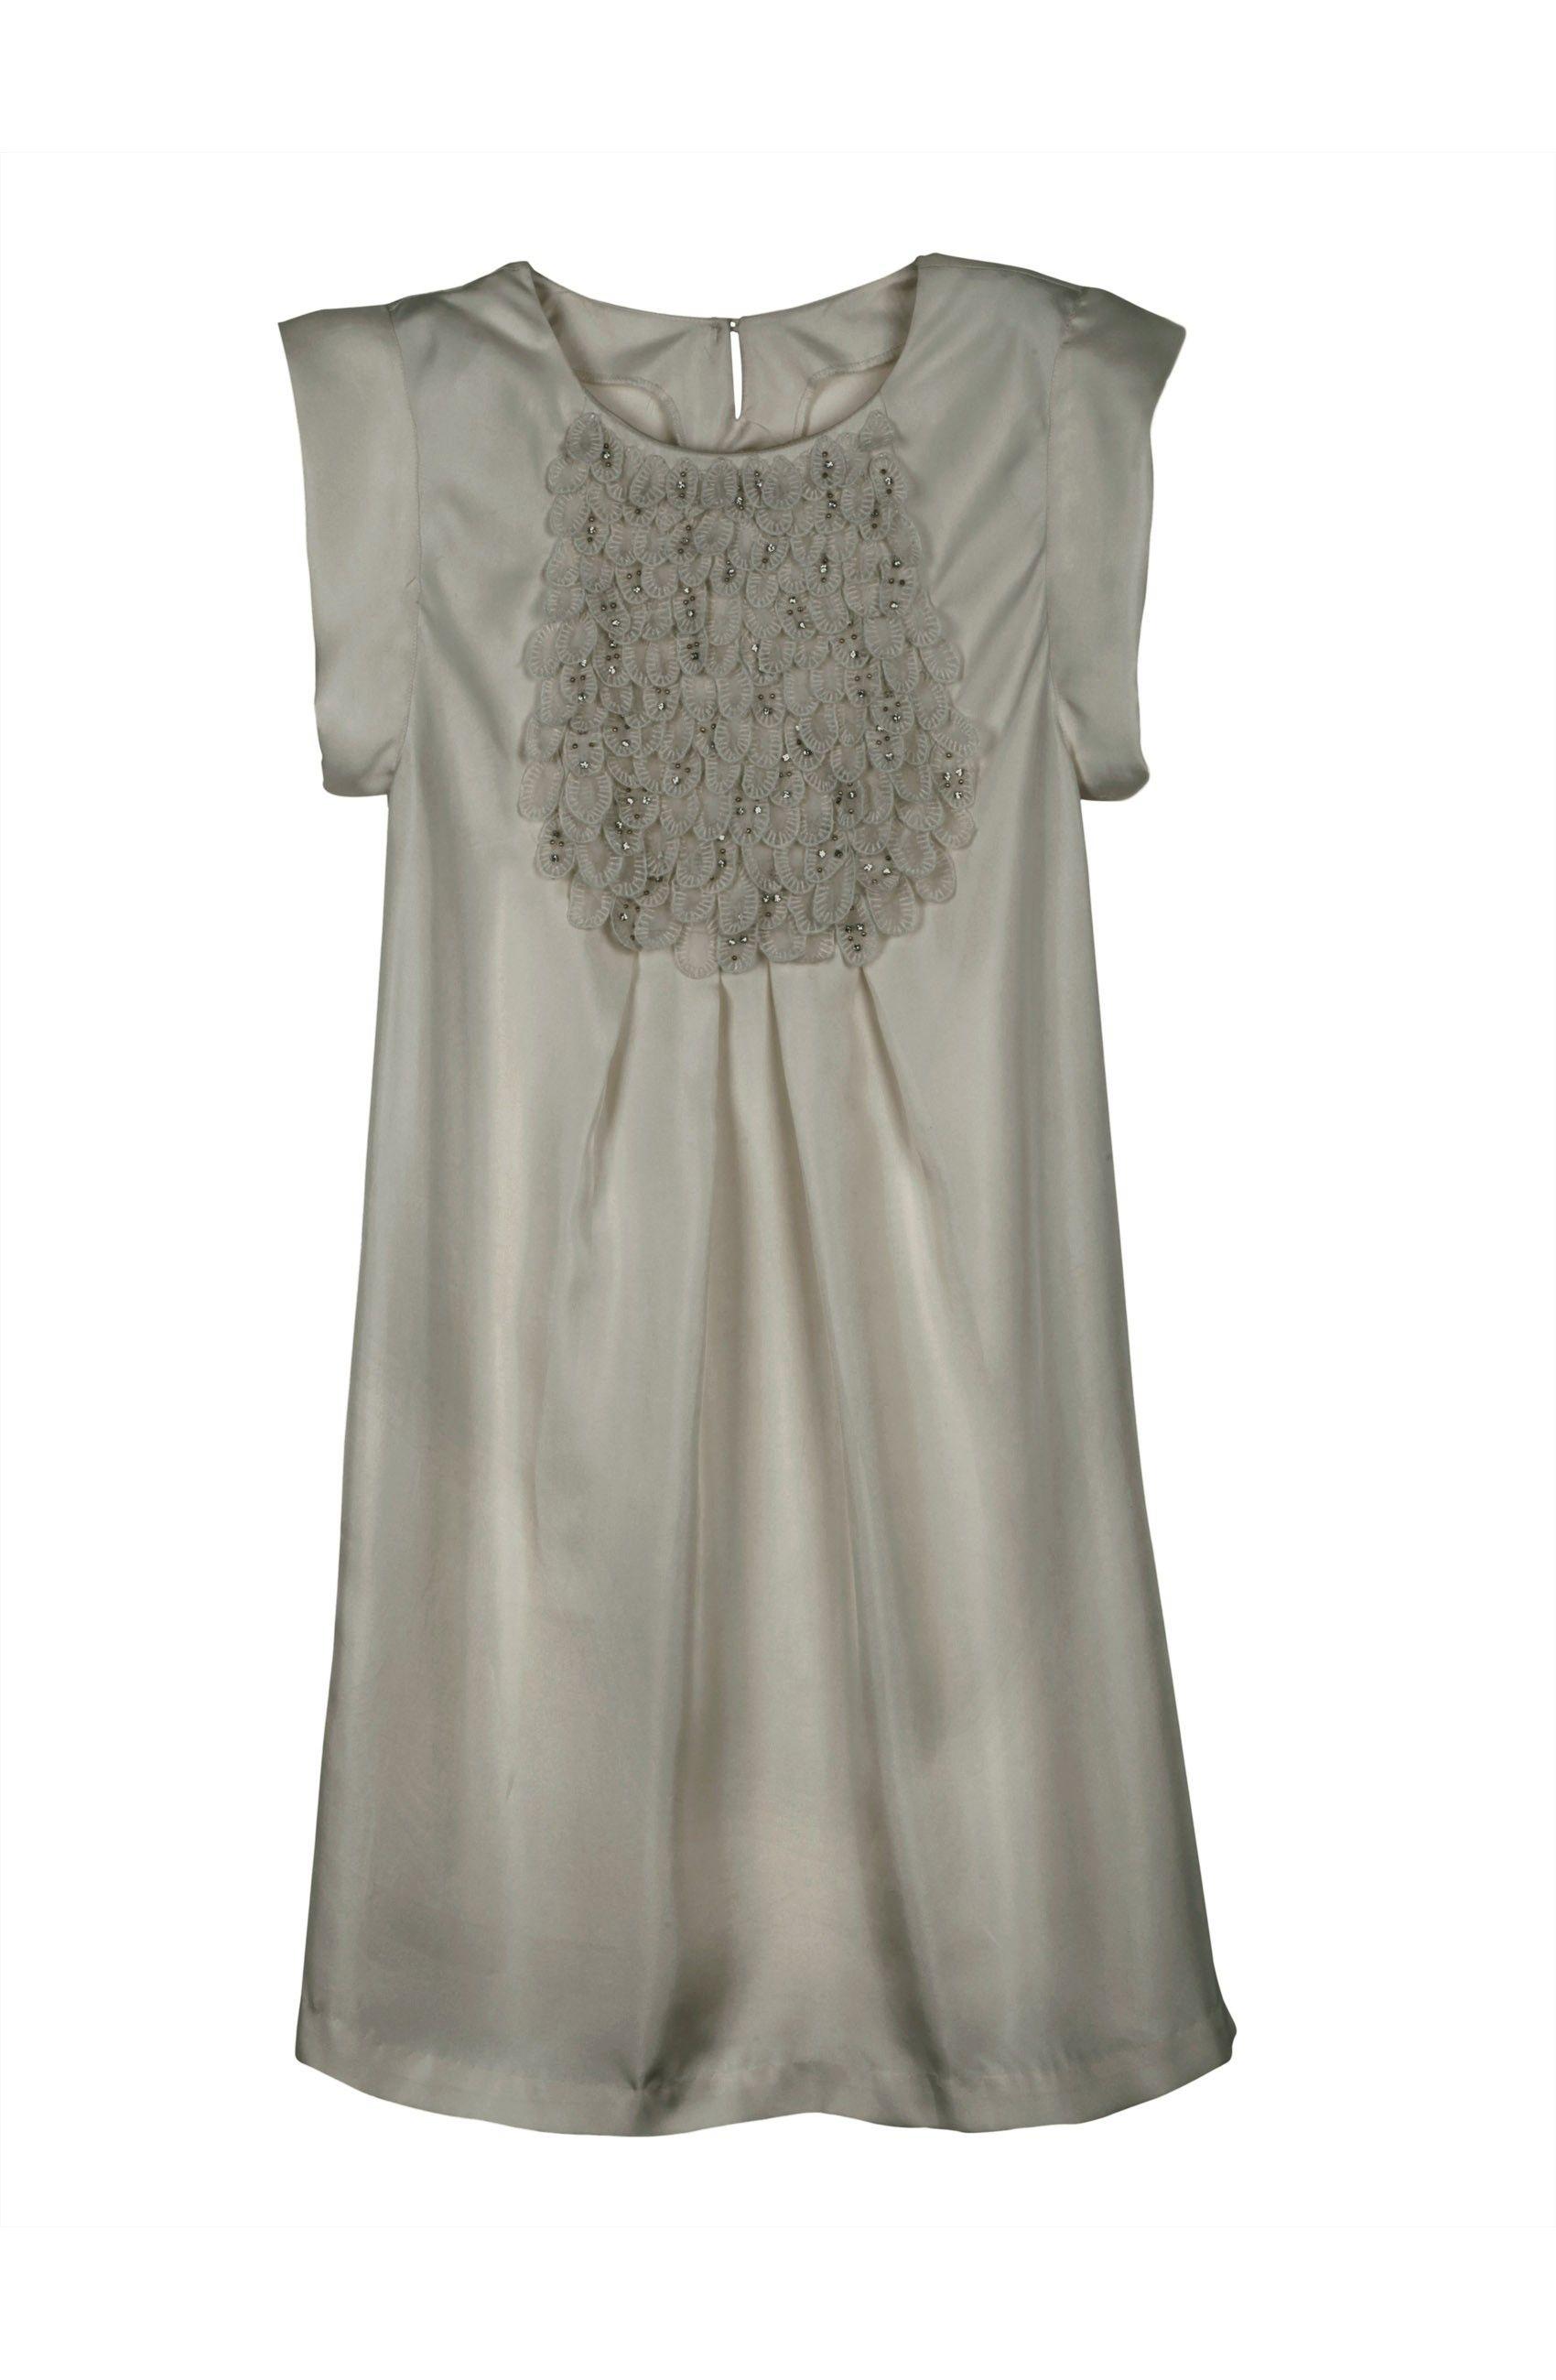 Neutral + Feminine. I wanna wear this with opaque leggings and peep-toe pumps.  Dress by Paul & Joe